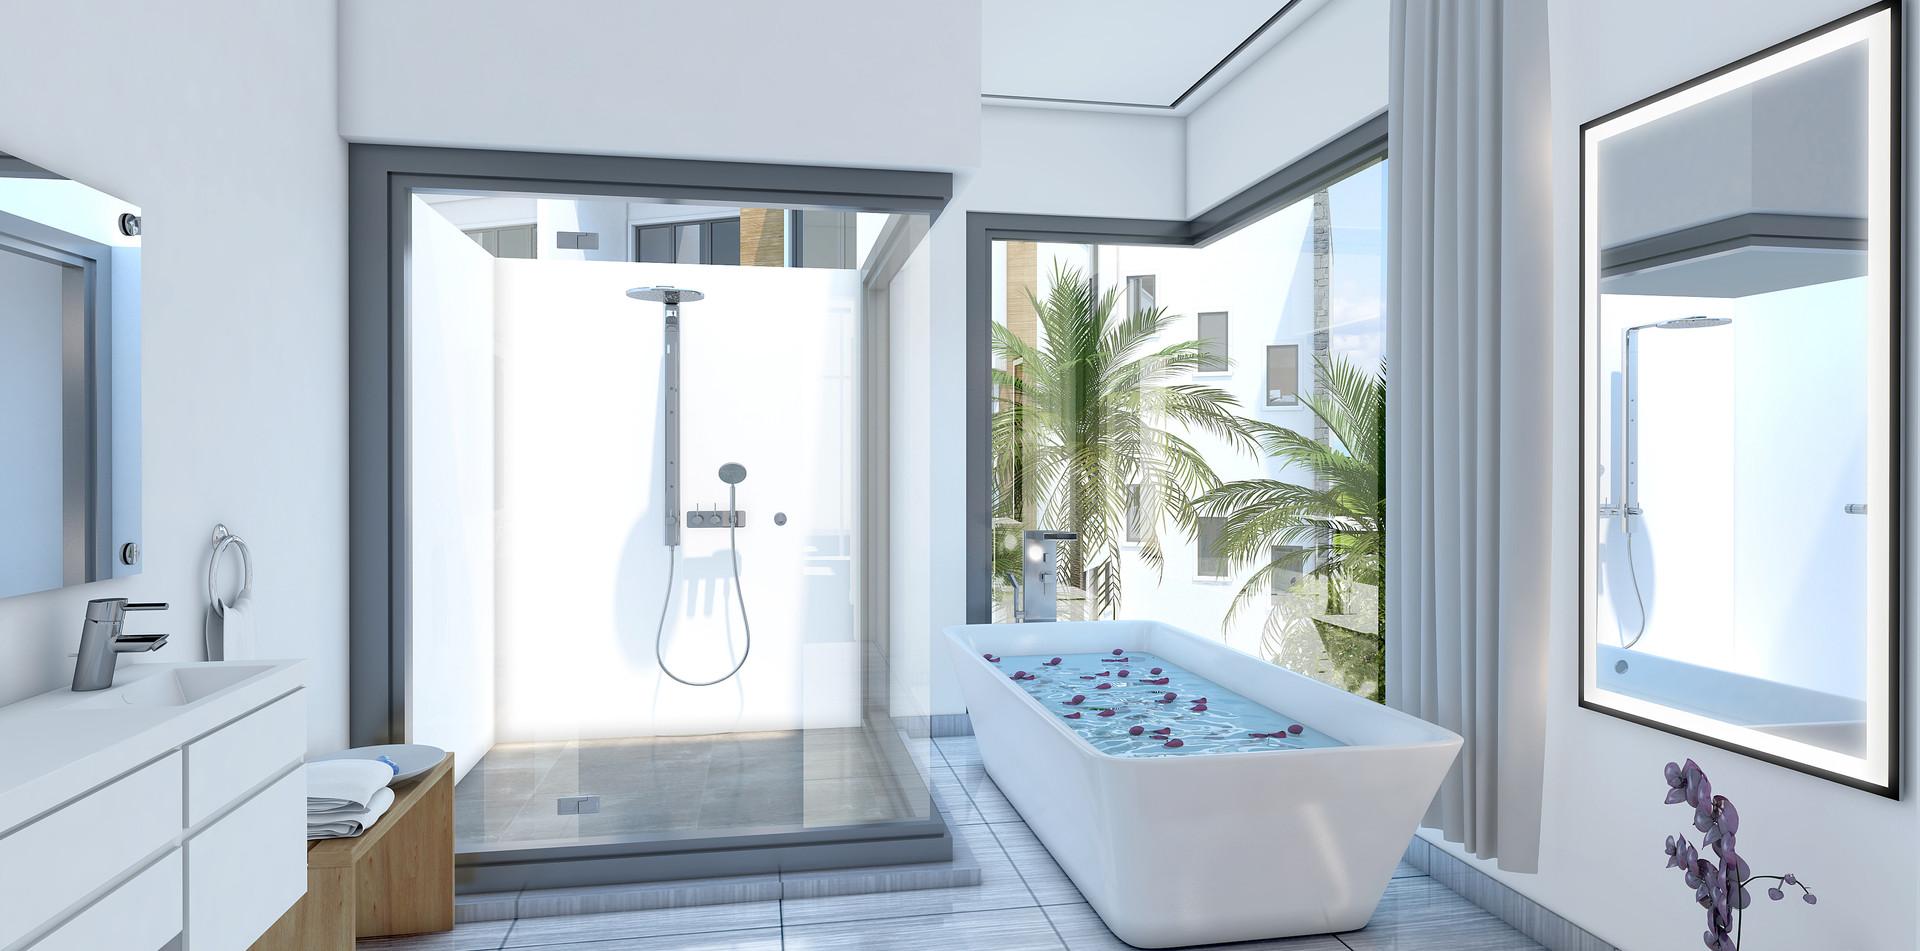 150429-ian-sunstone-back_villa_bathroom.